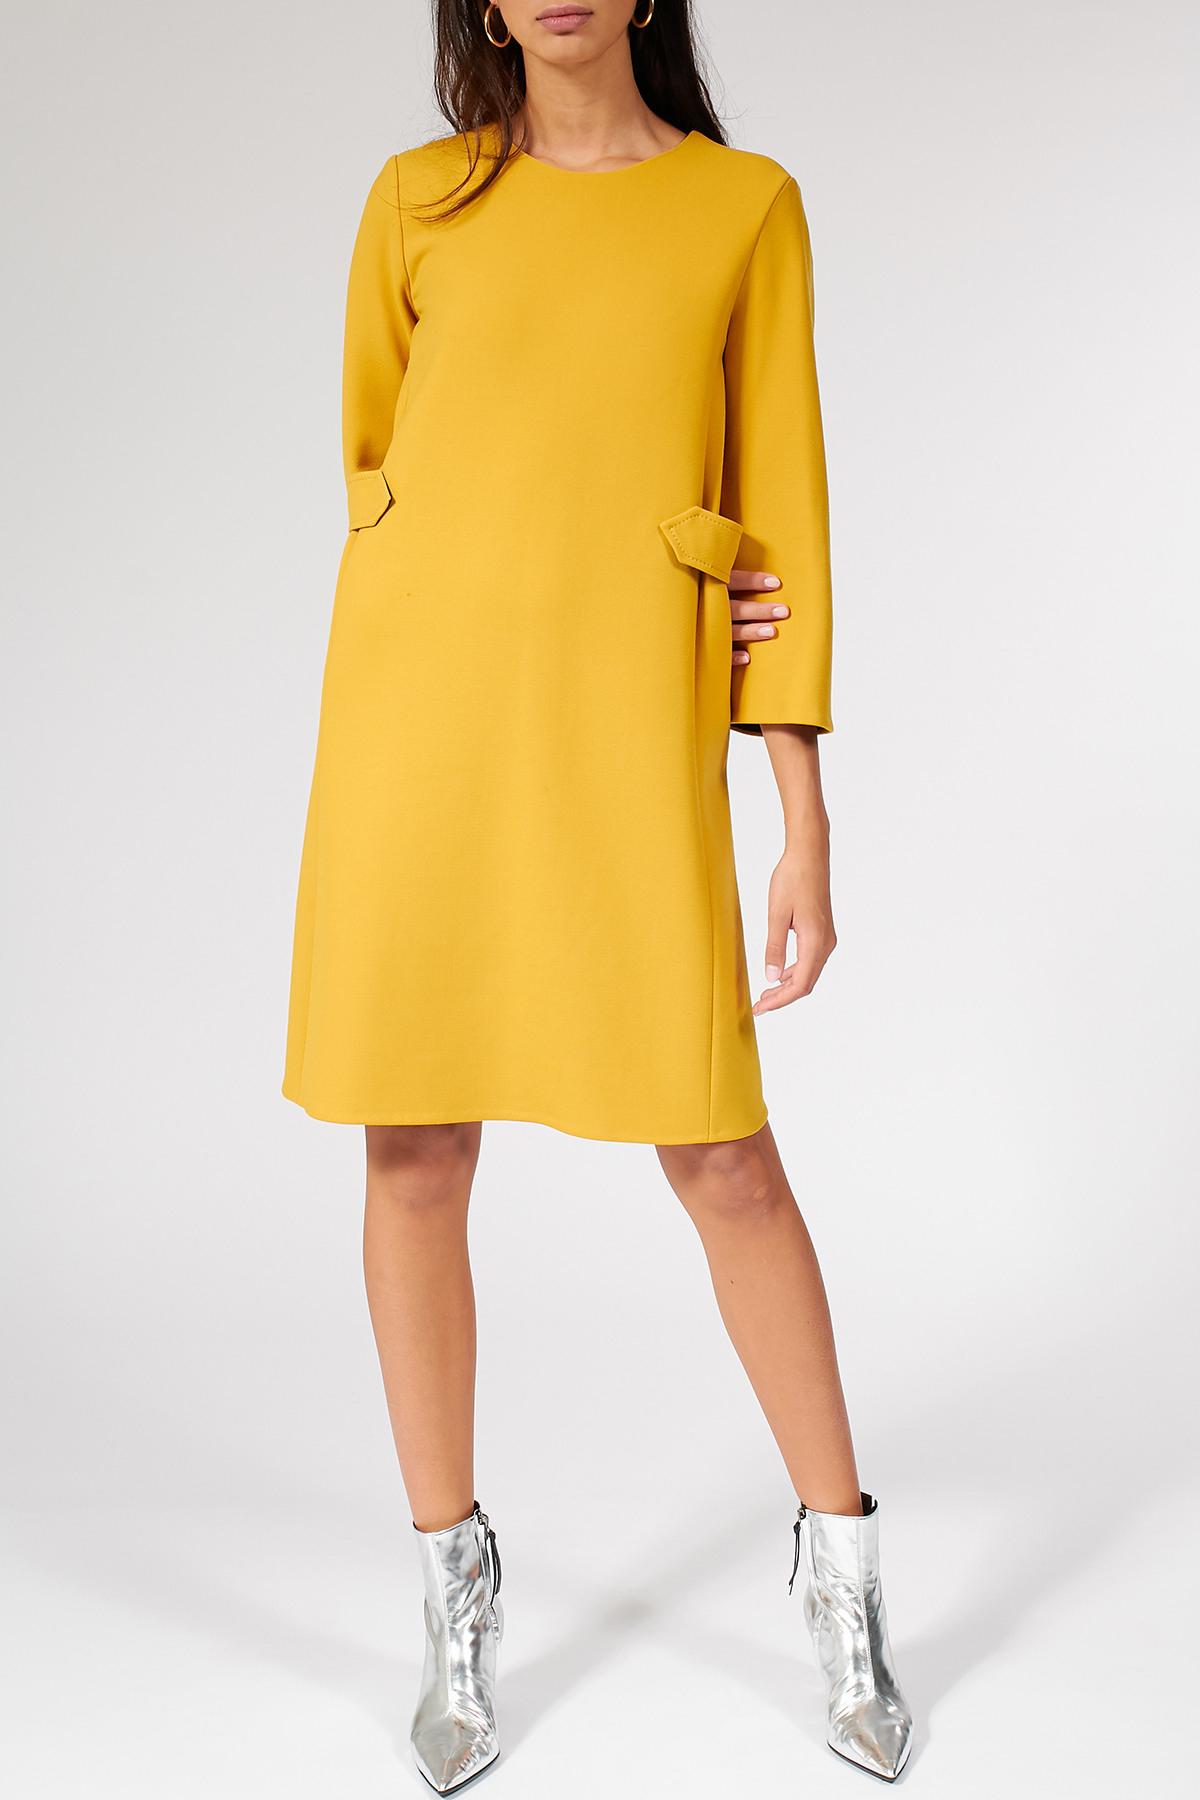 Straight Shift Kleid Shopping 752B0 Ffa0C